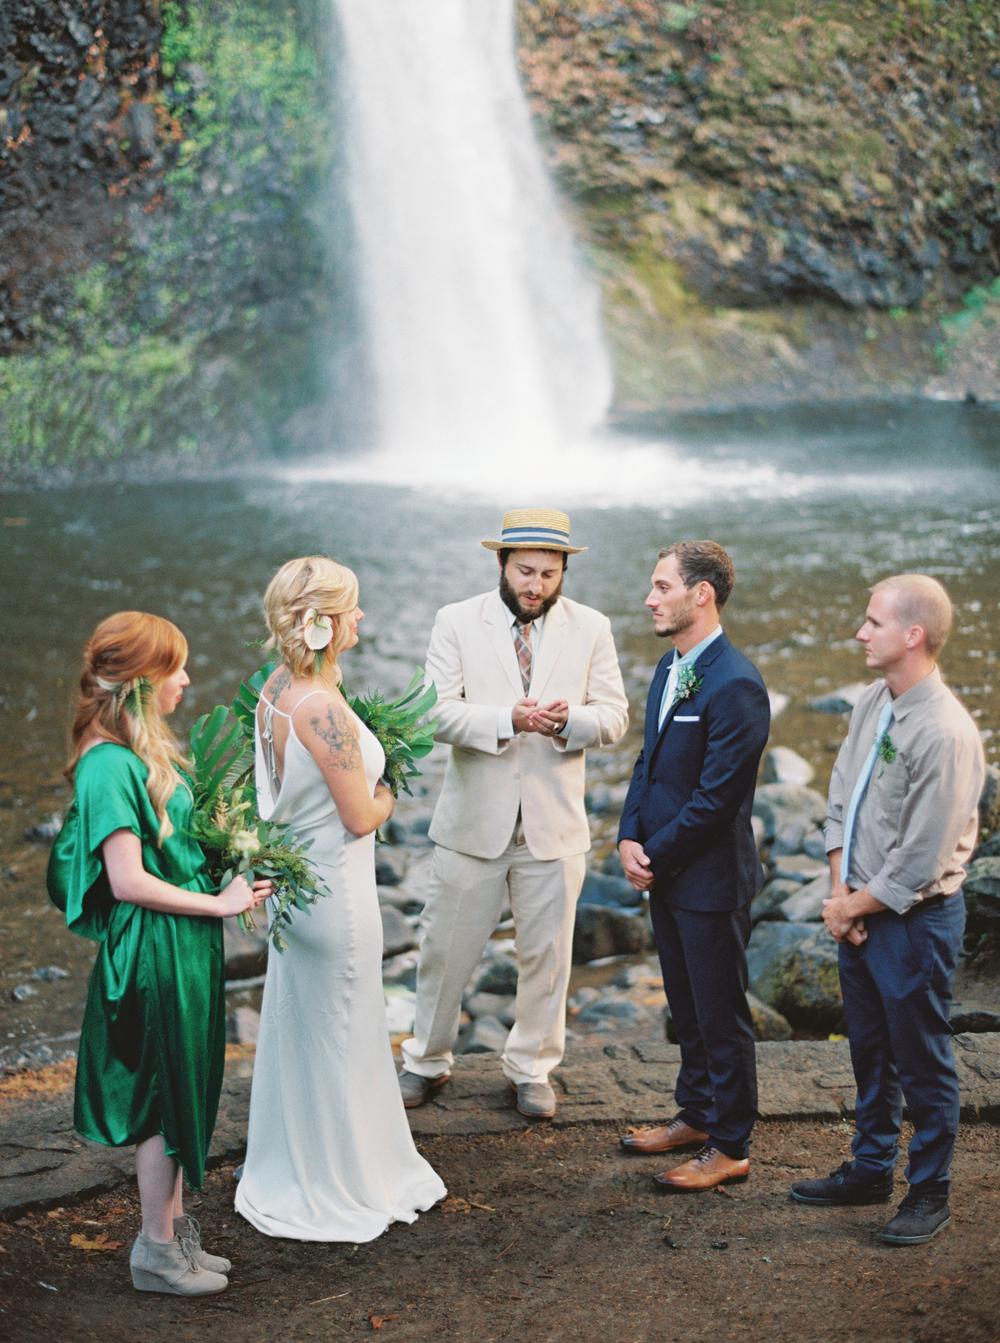 045Outlive+Creative+Tropical+Northwest+Columbia+Gorge+Elopement+Film+Photographer.jpg